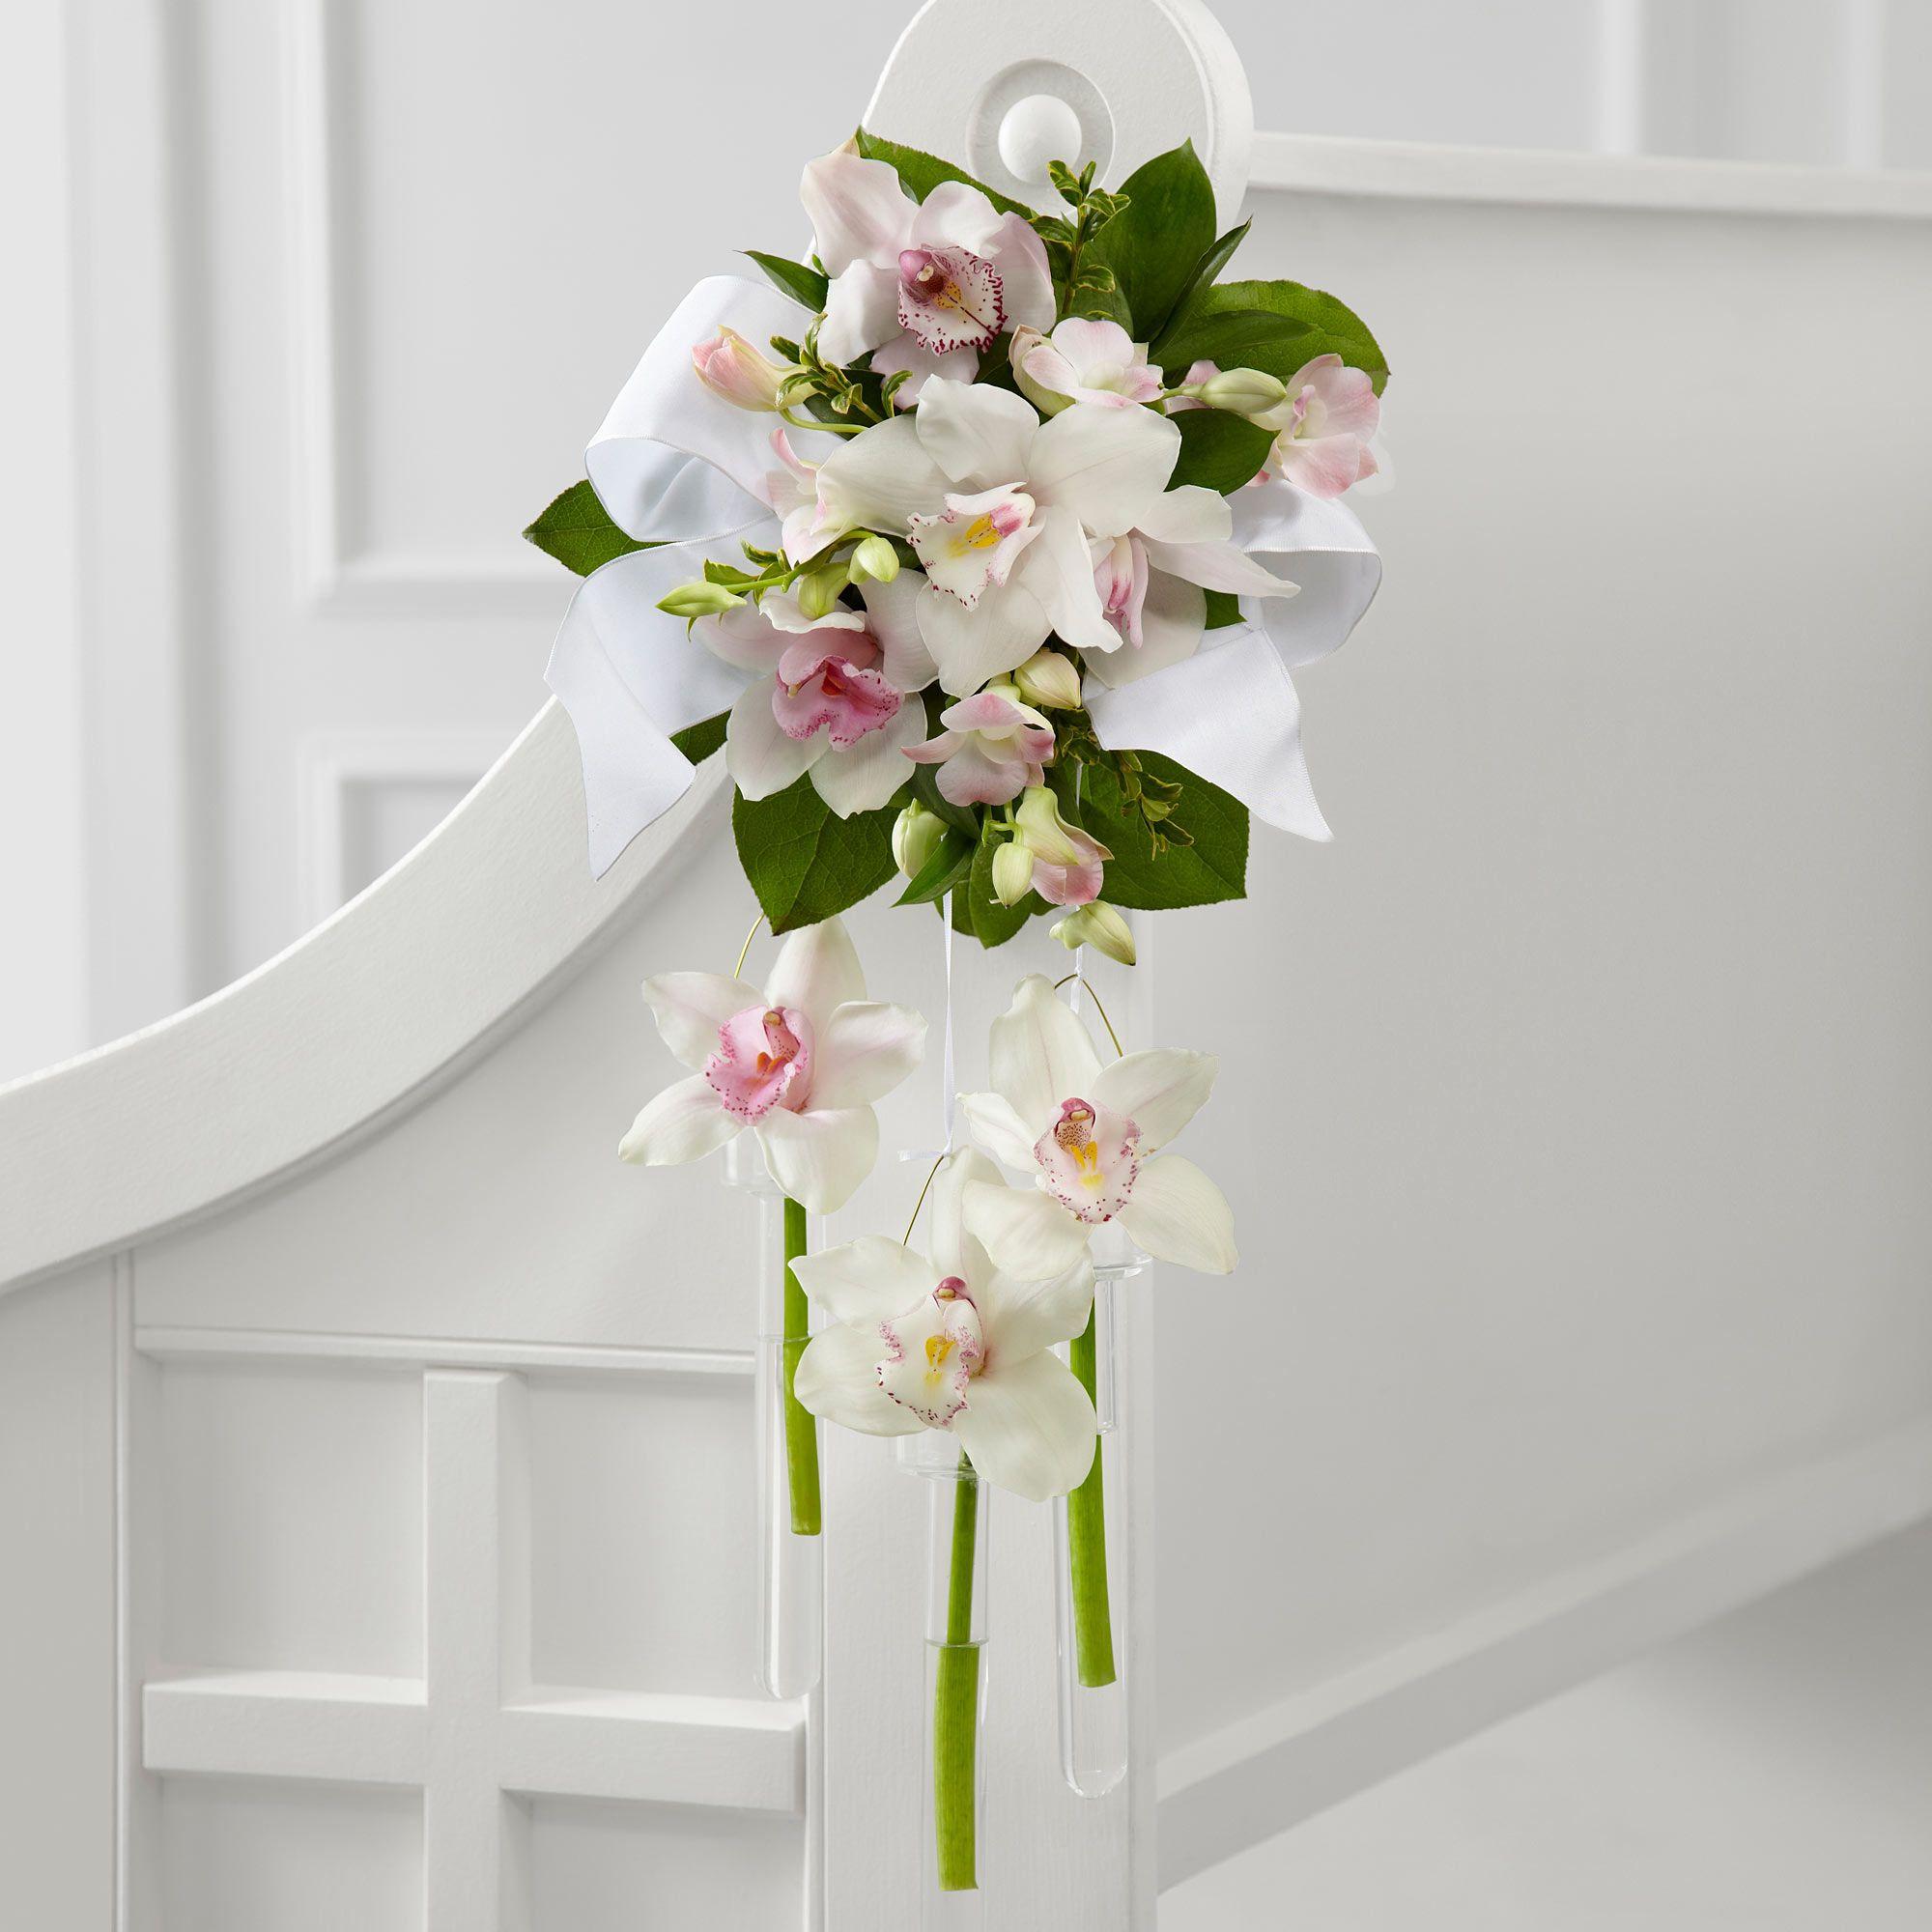 Beautiful Flower Arrangements For Weddings: Beautiful Pew End Floral Arrangement.